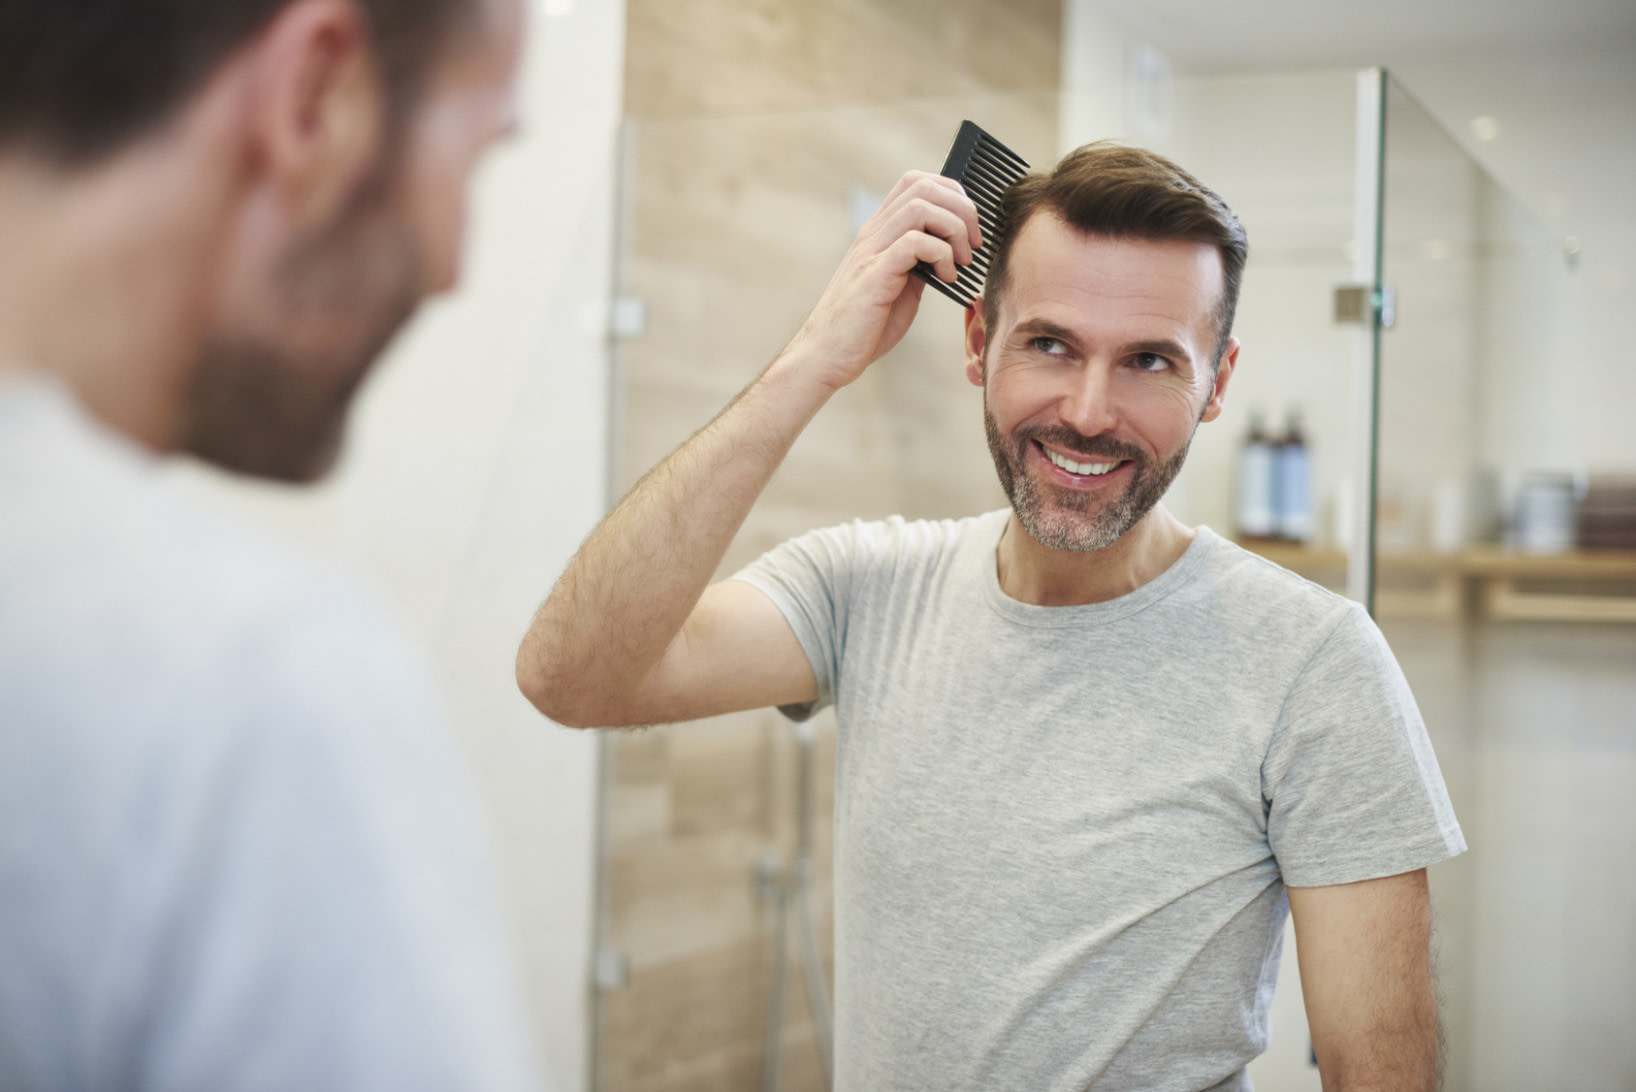 genial Frisuren bei Haarausfall für Männer und Frauen  Haarzentrum an  - frisur hinterkopf mann